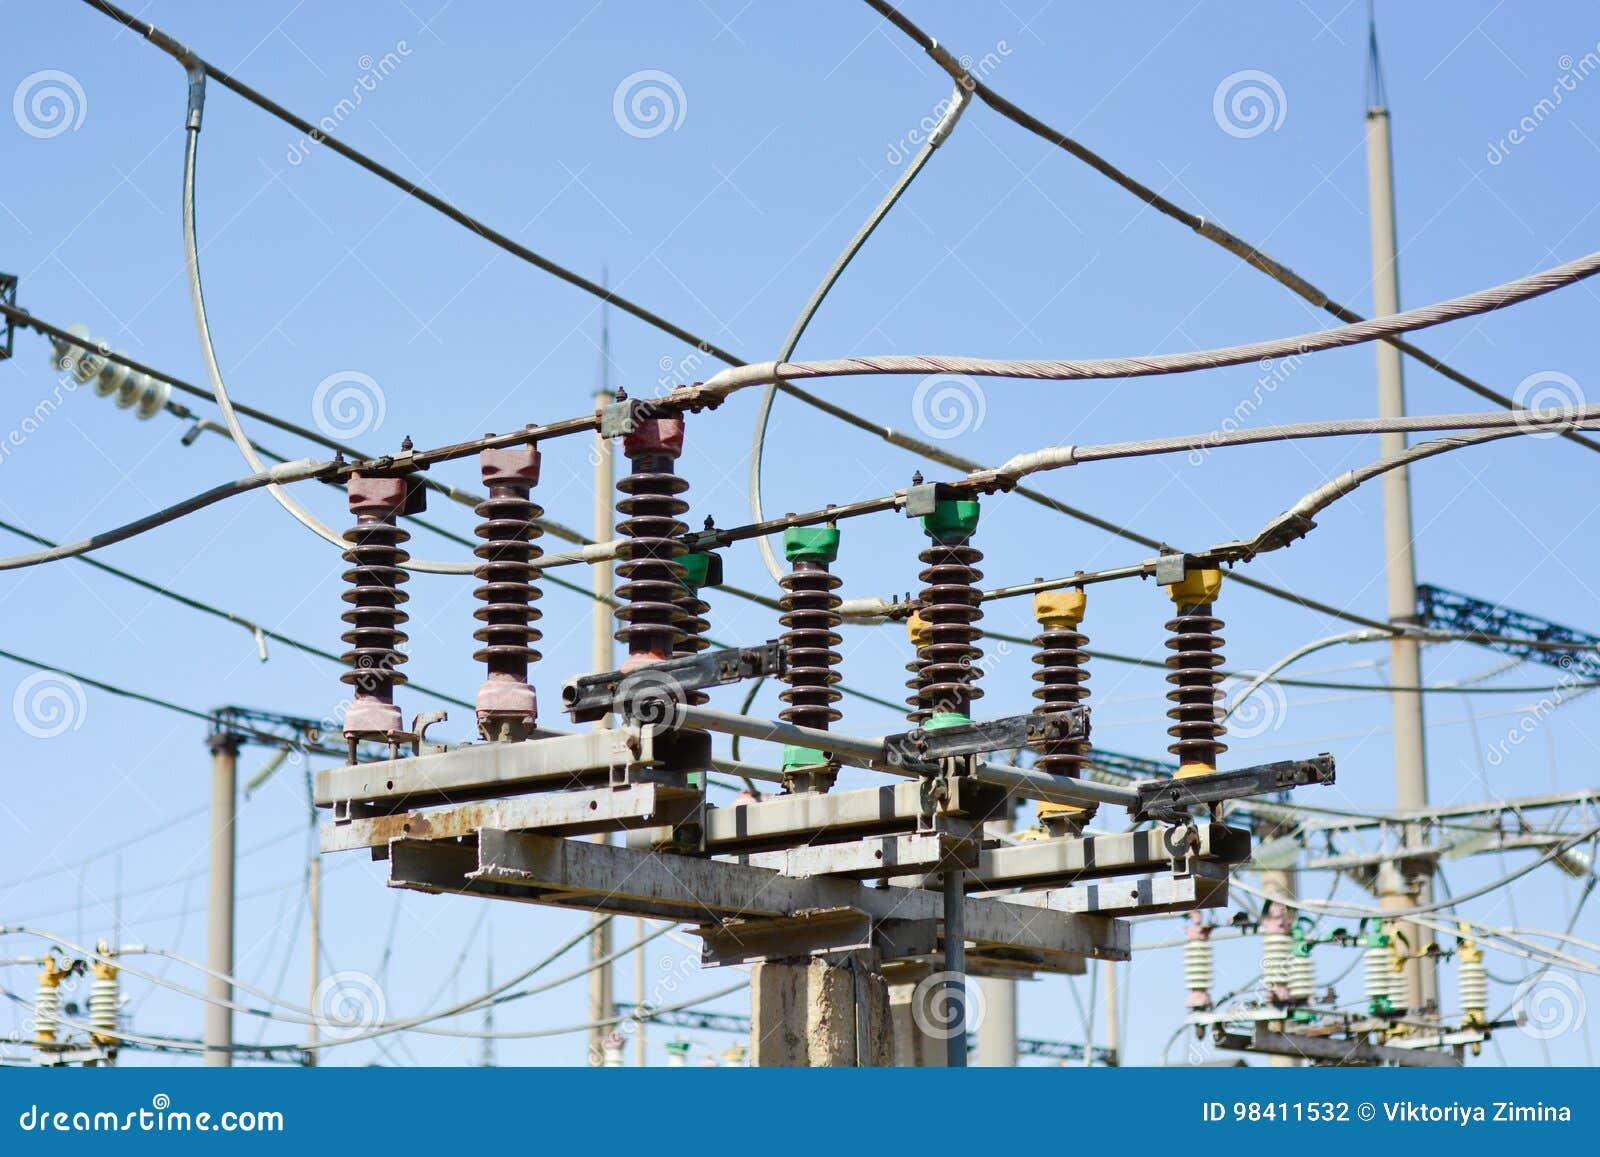 Electrical high voltage substation